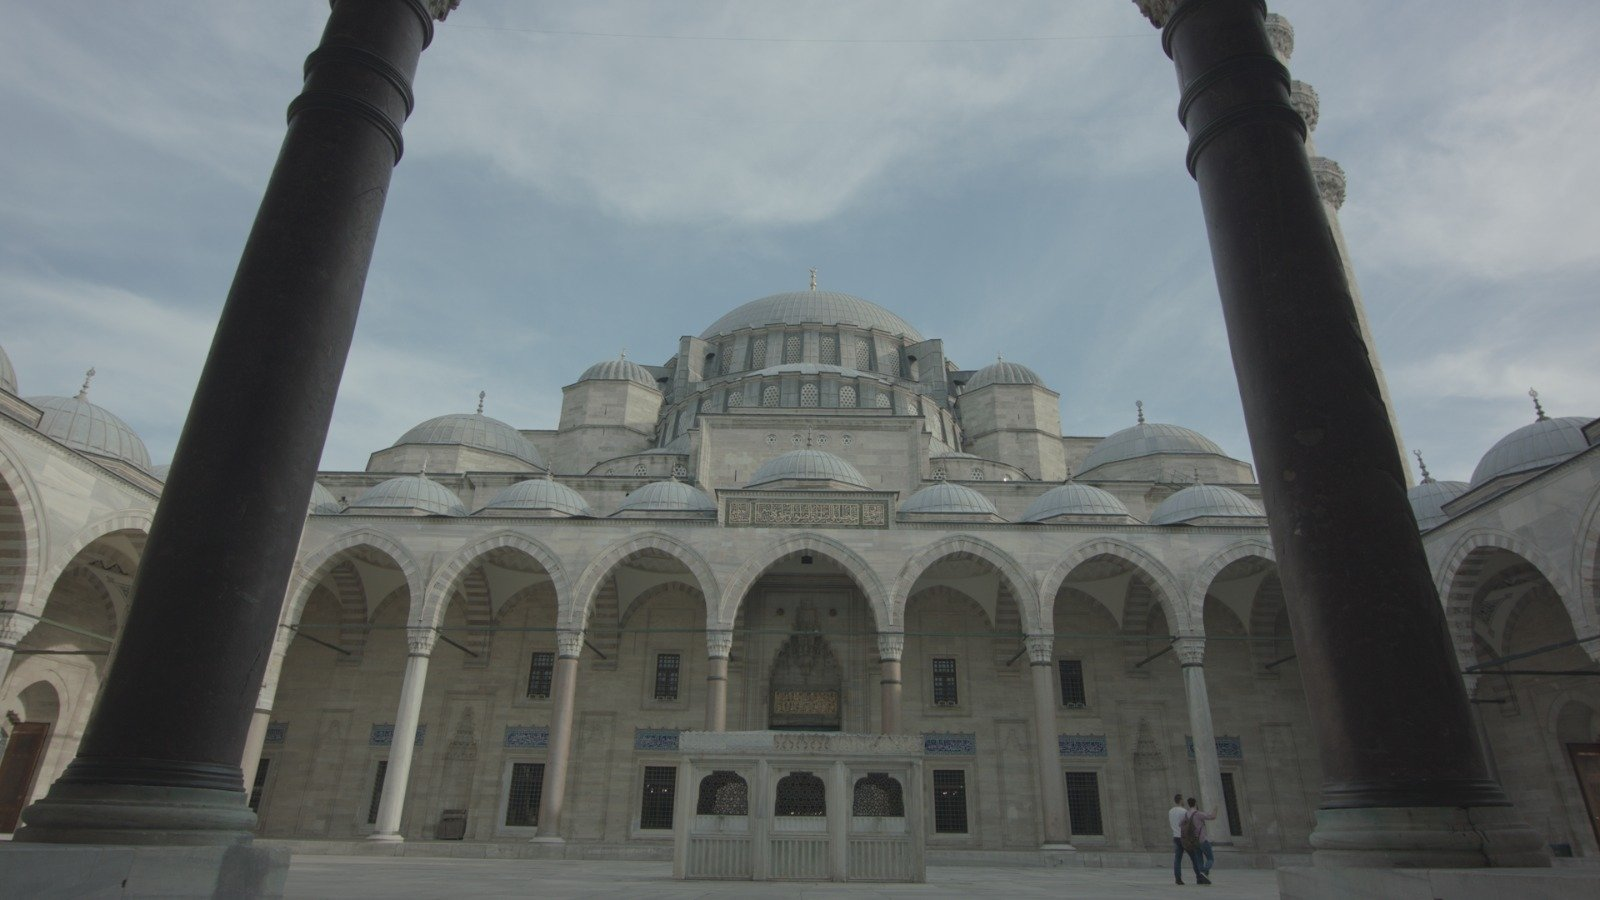 A still shot from the documentary shows Mimar Sinan's Süleymaniye Mosque in Istanbul, Turkey.